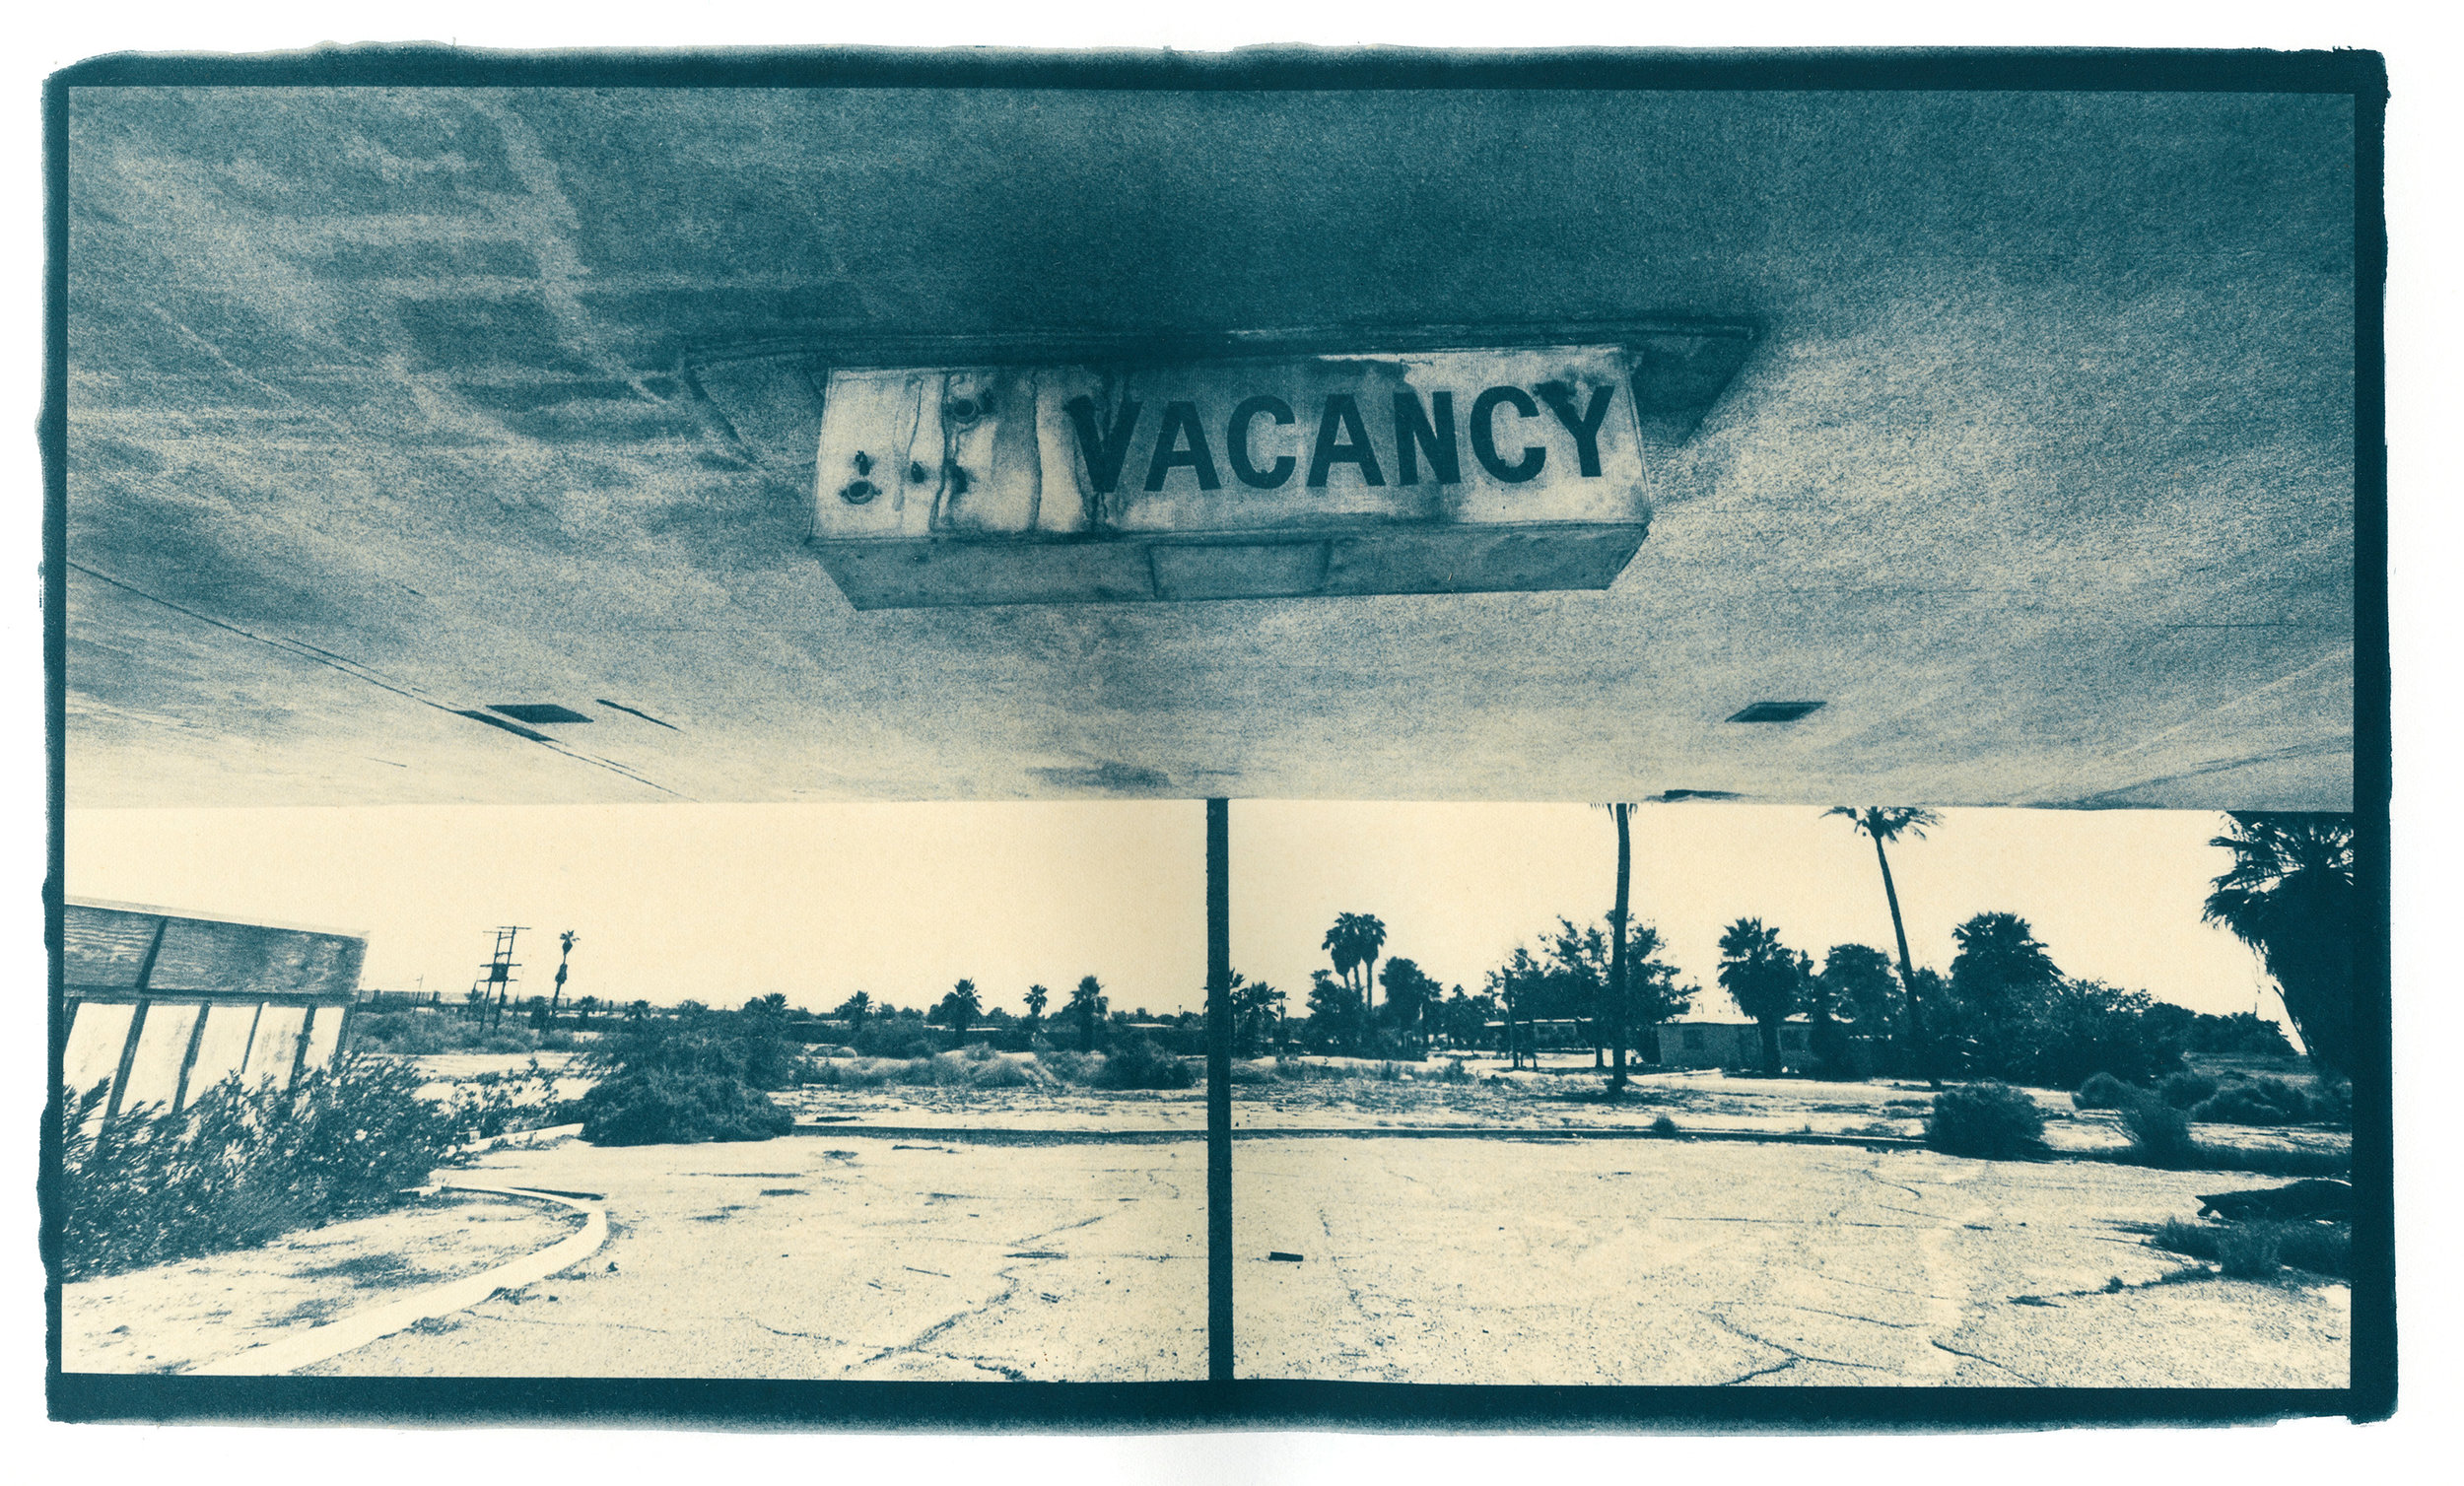 Vacancy002-Editsm.jpg